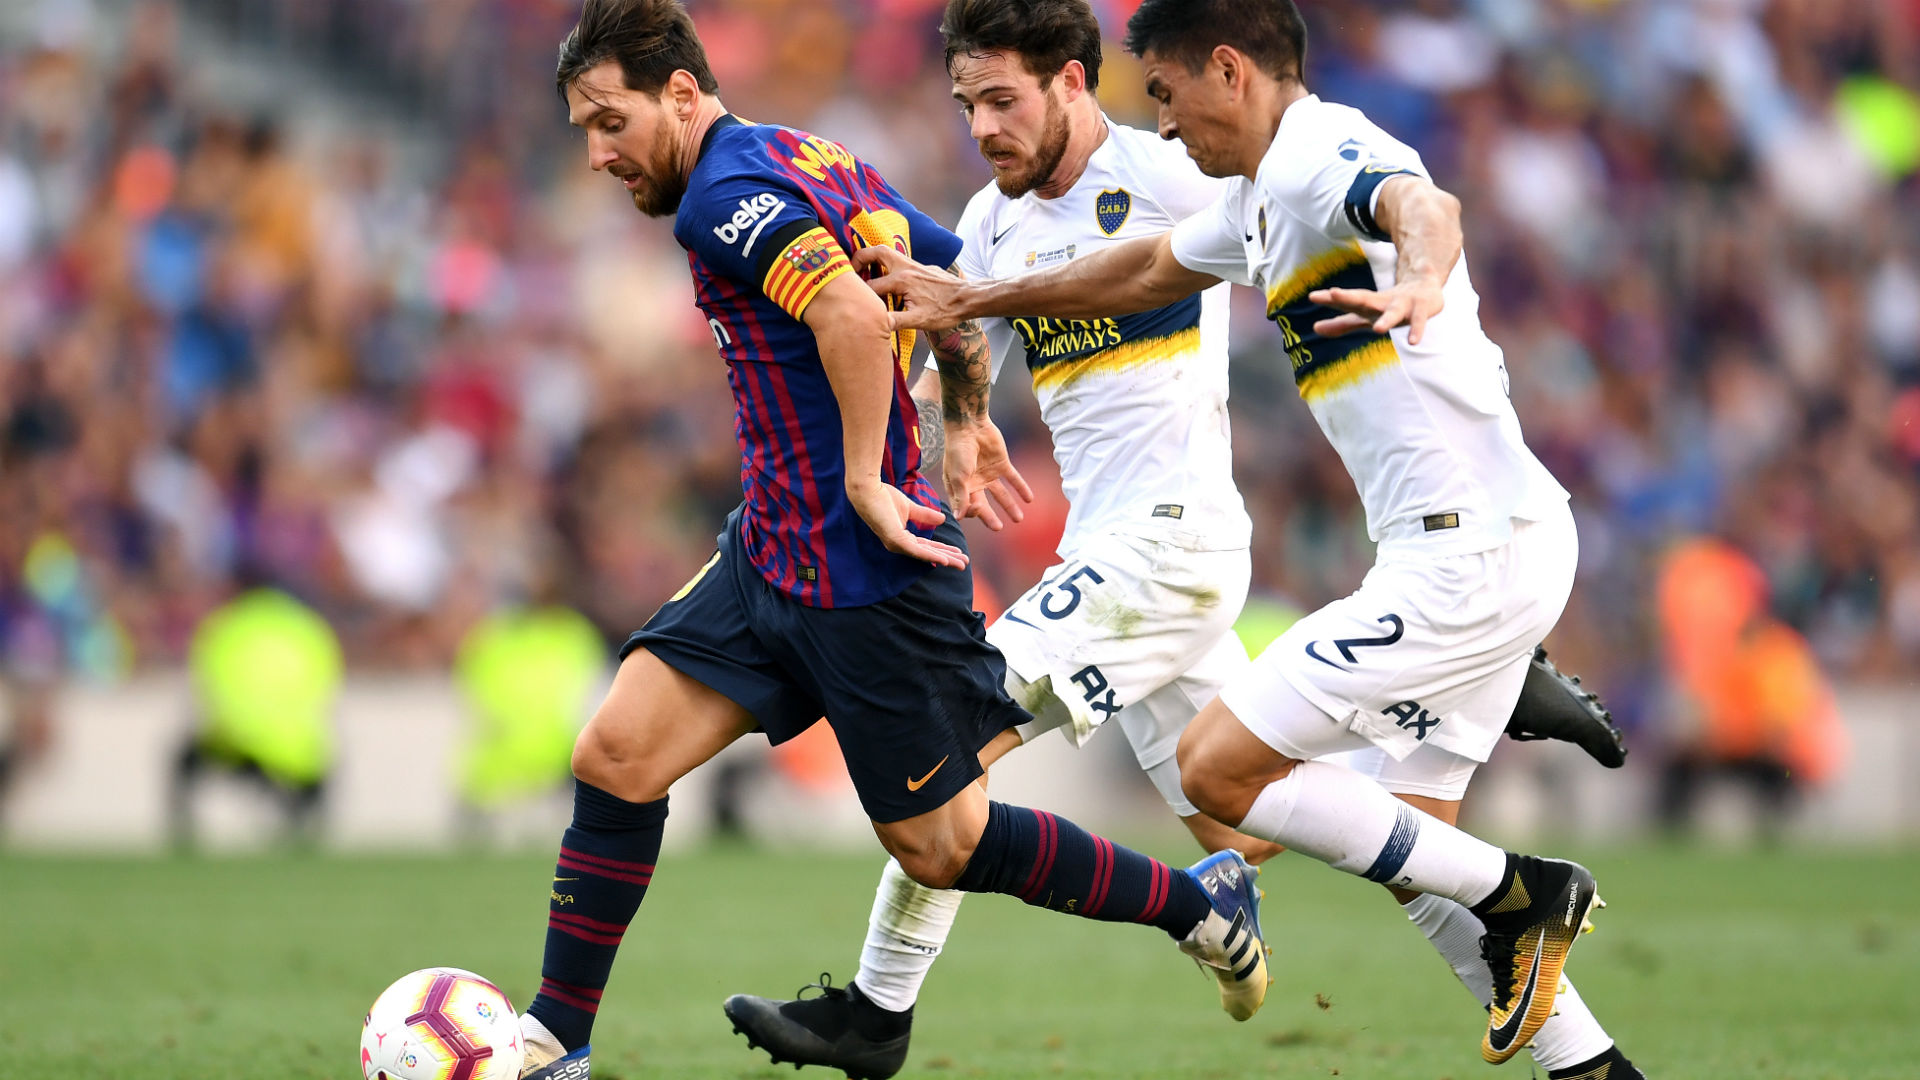 Lionel Messi Paolo Goltz Nahitan Nandez Barcelona Boca Joan Gamper 150818 6be1436cdaf